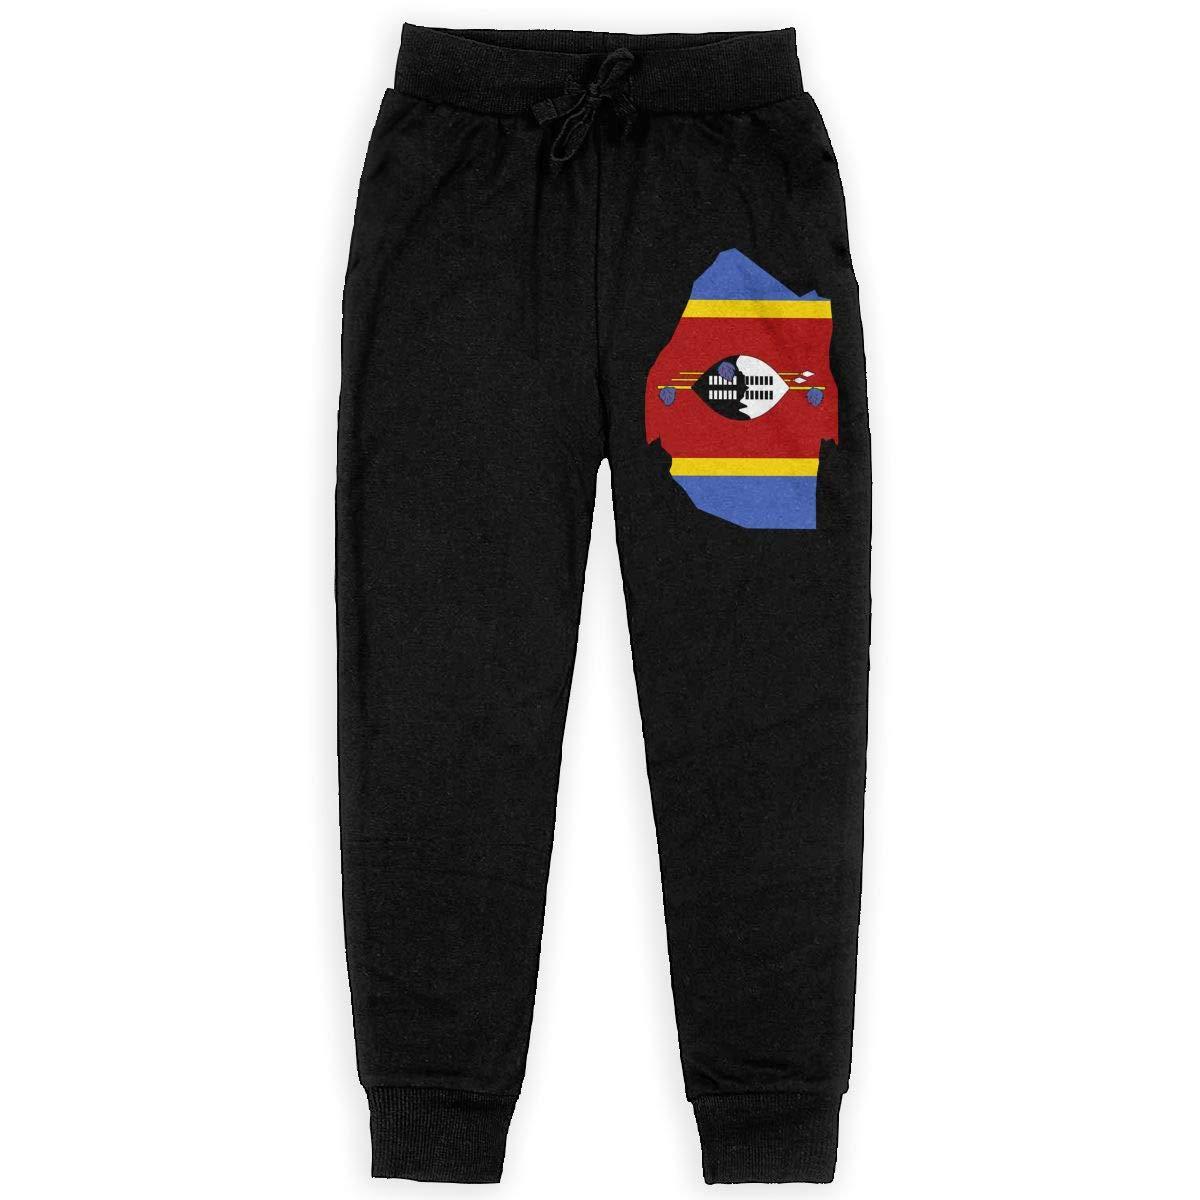 IufnNRJndfu Swaziland Boys Athletic Smart Fleece Pant Youth Soft and Cozy Sweatpants